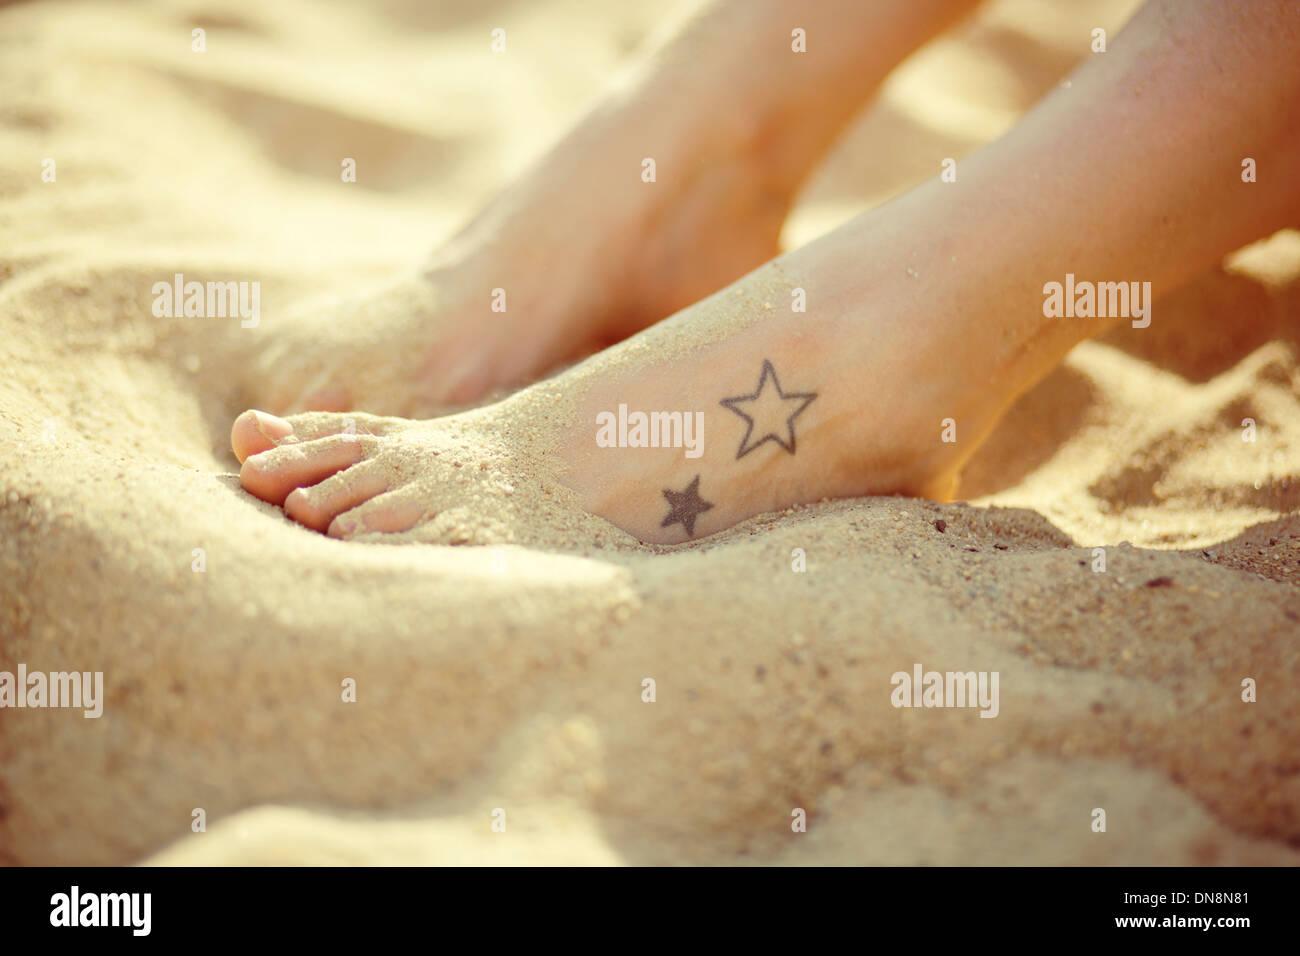 Feet with tatoo on the sandy beach - Stock Image